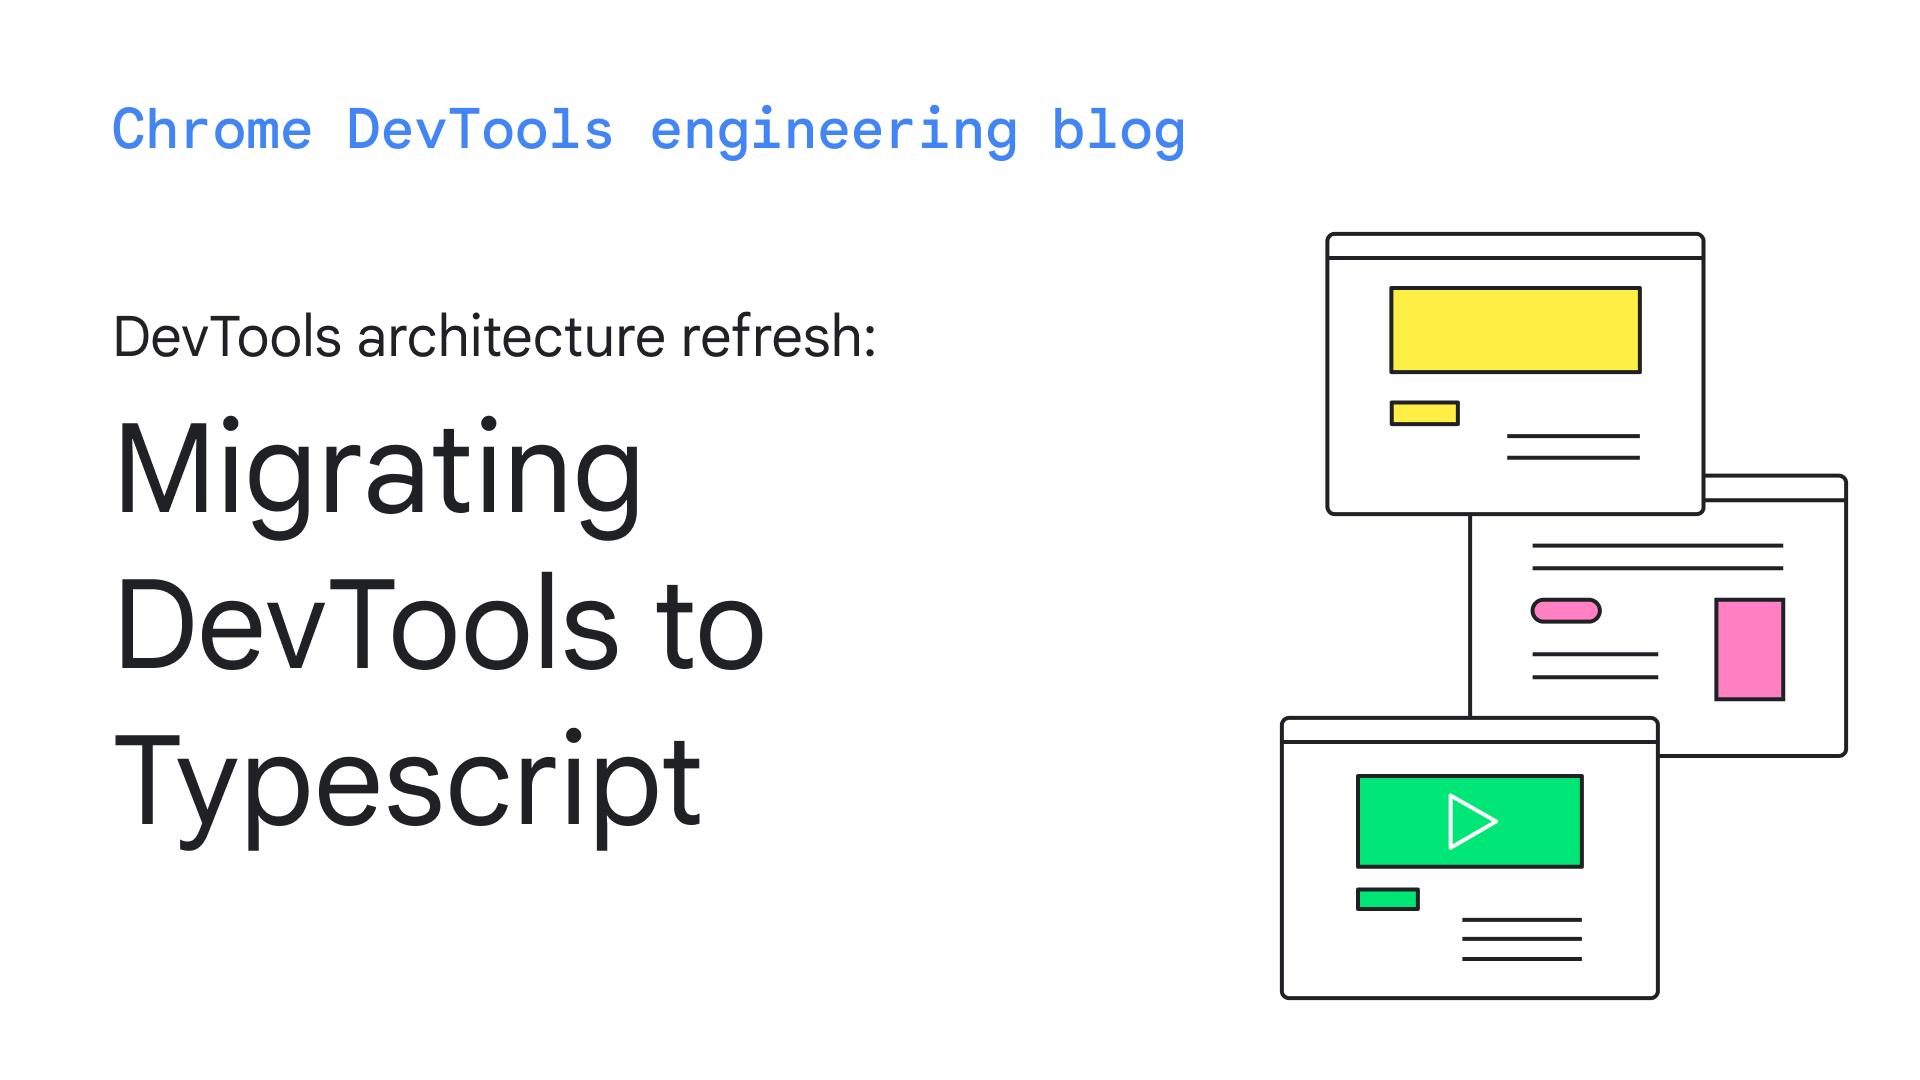 DevTools architecture refresh: migrating DevTools to TypeScript